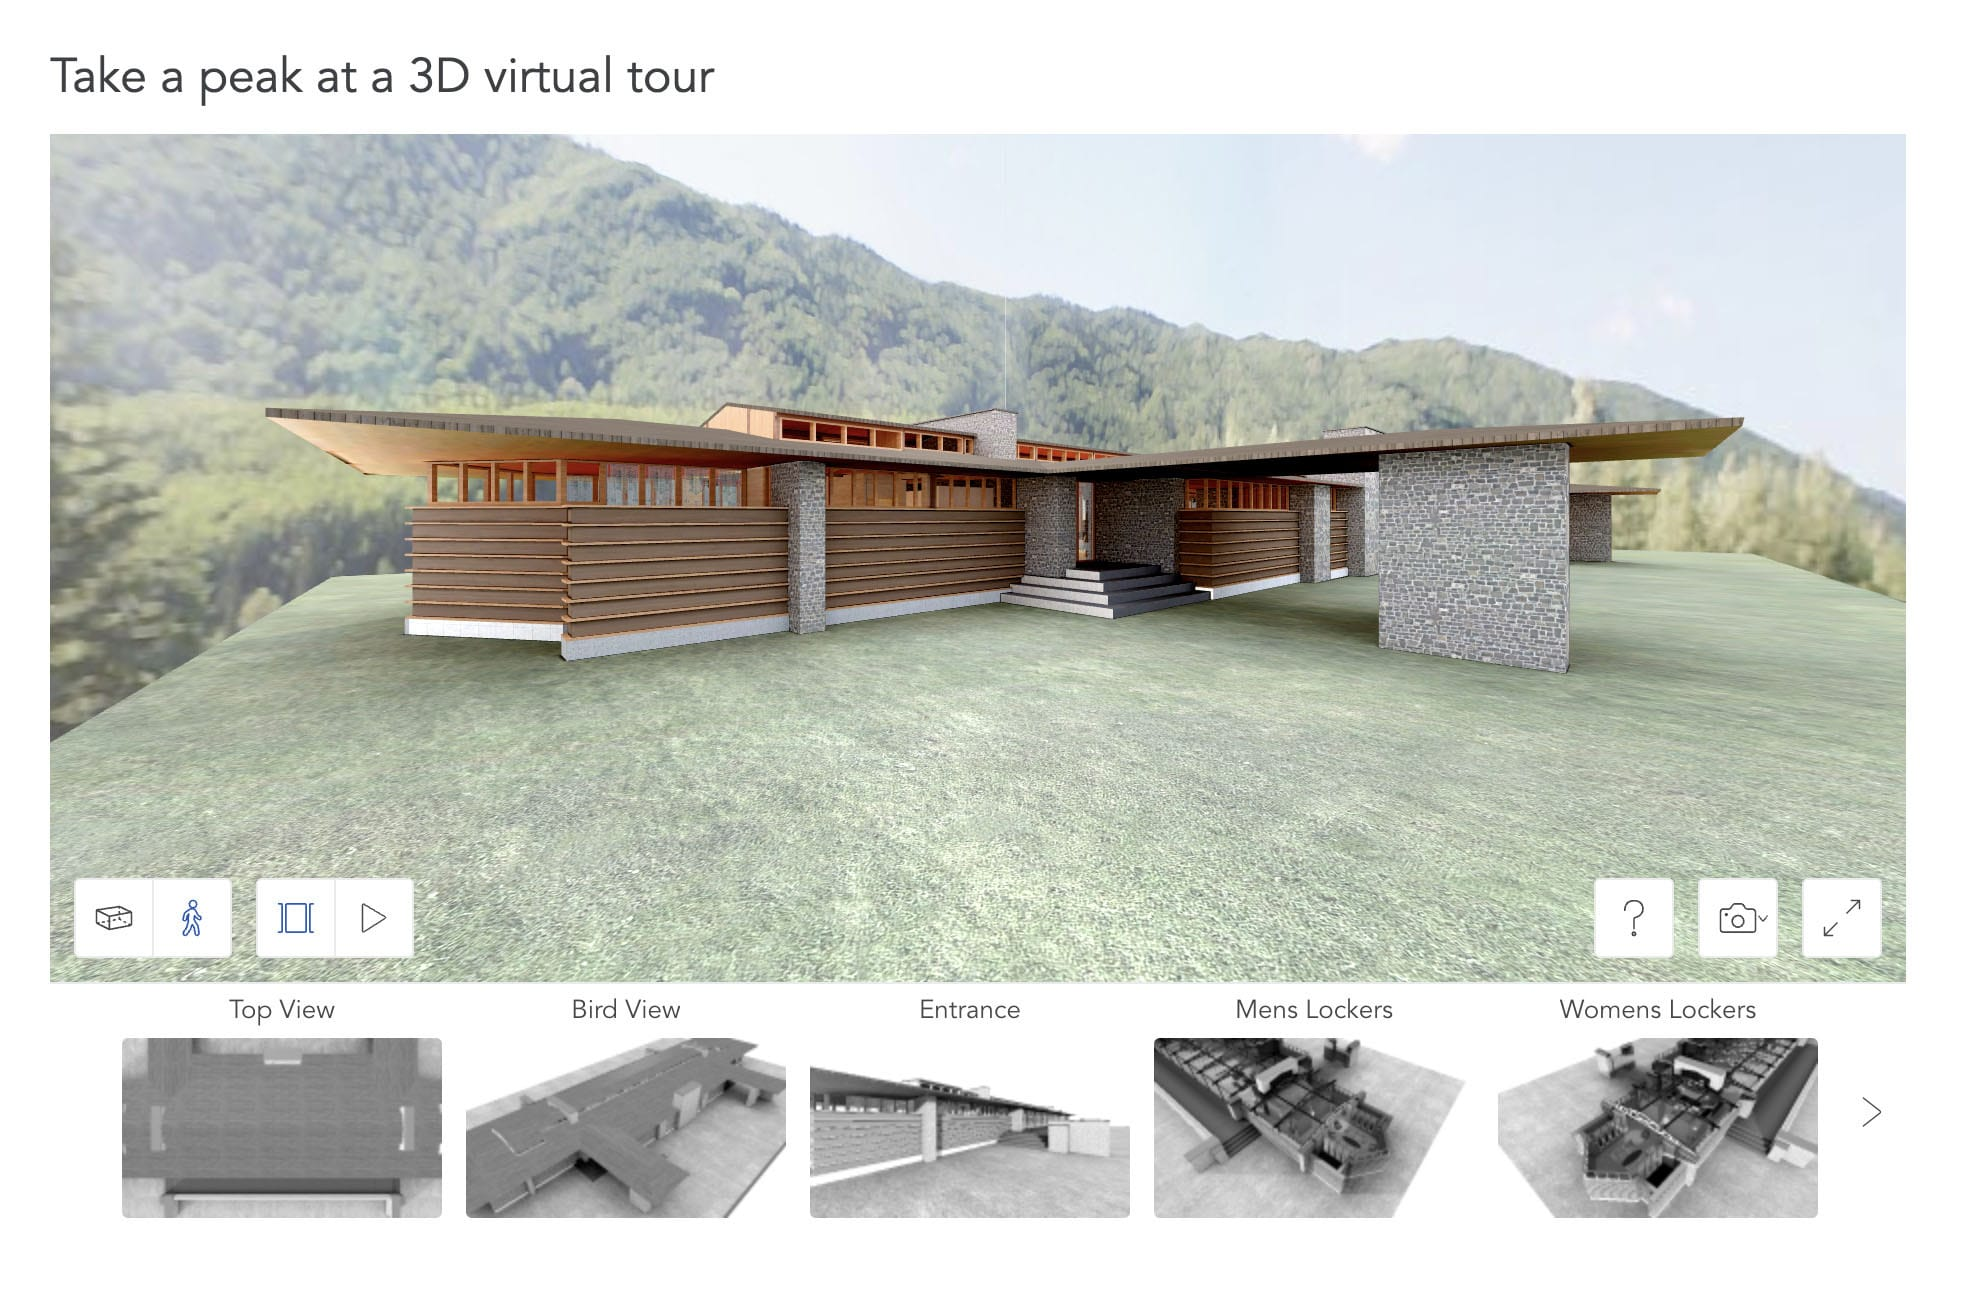 Making a virtual tourwith Archilogic